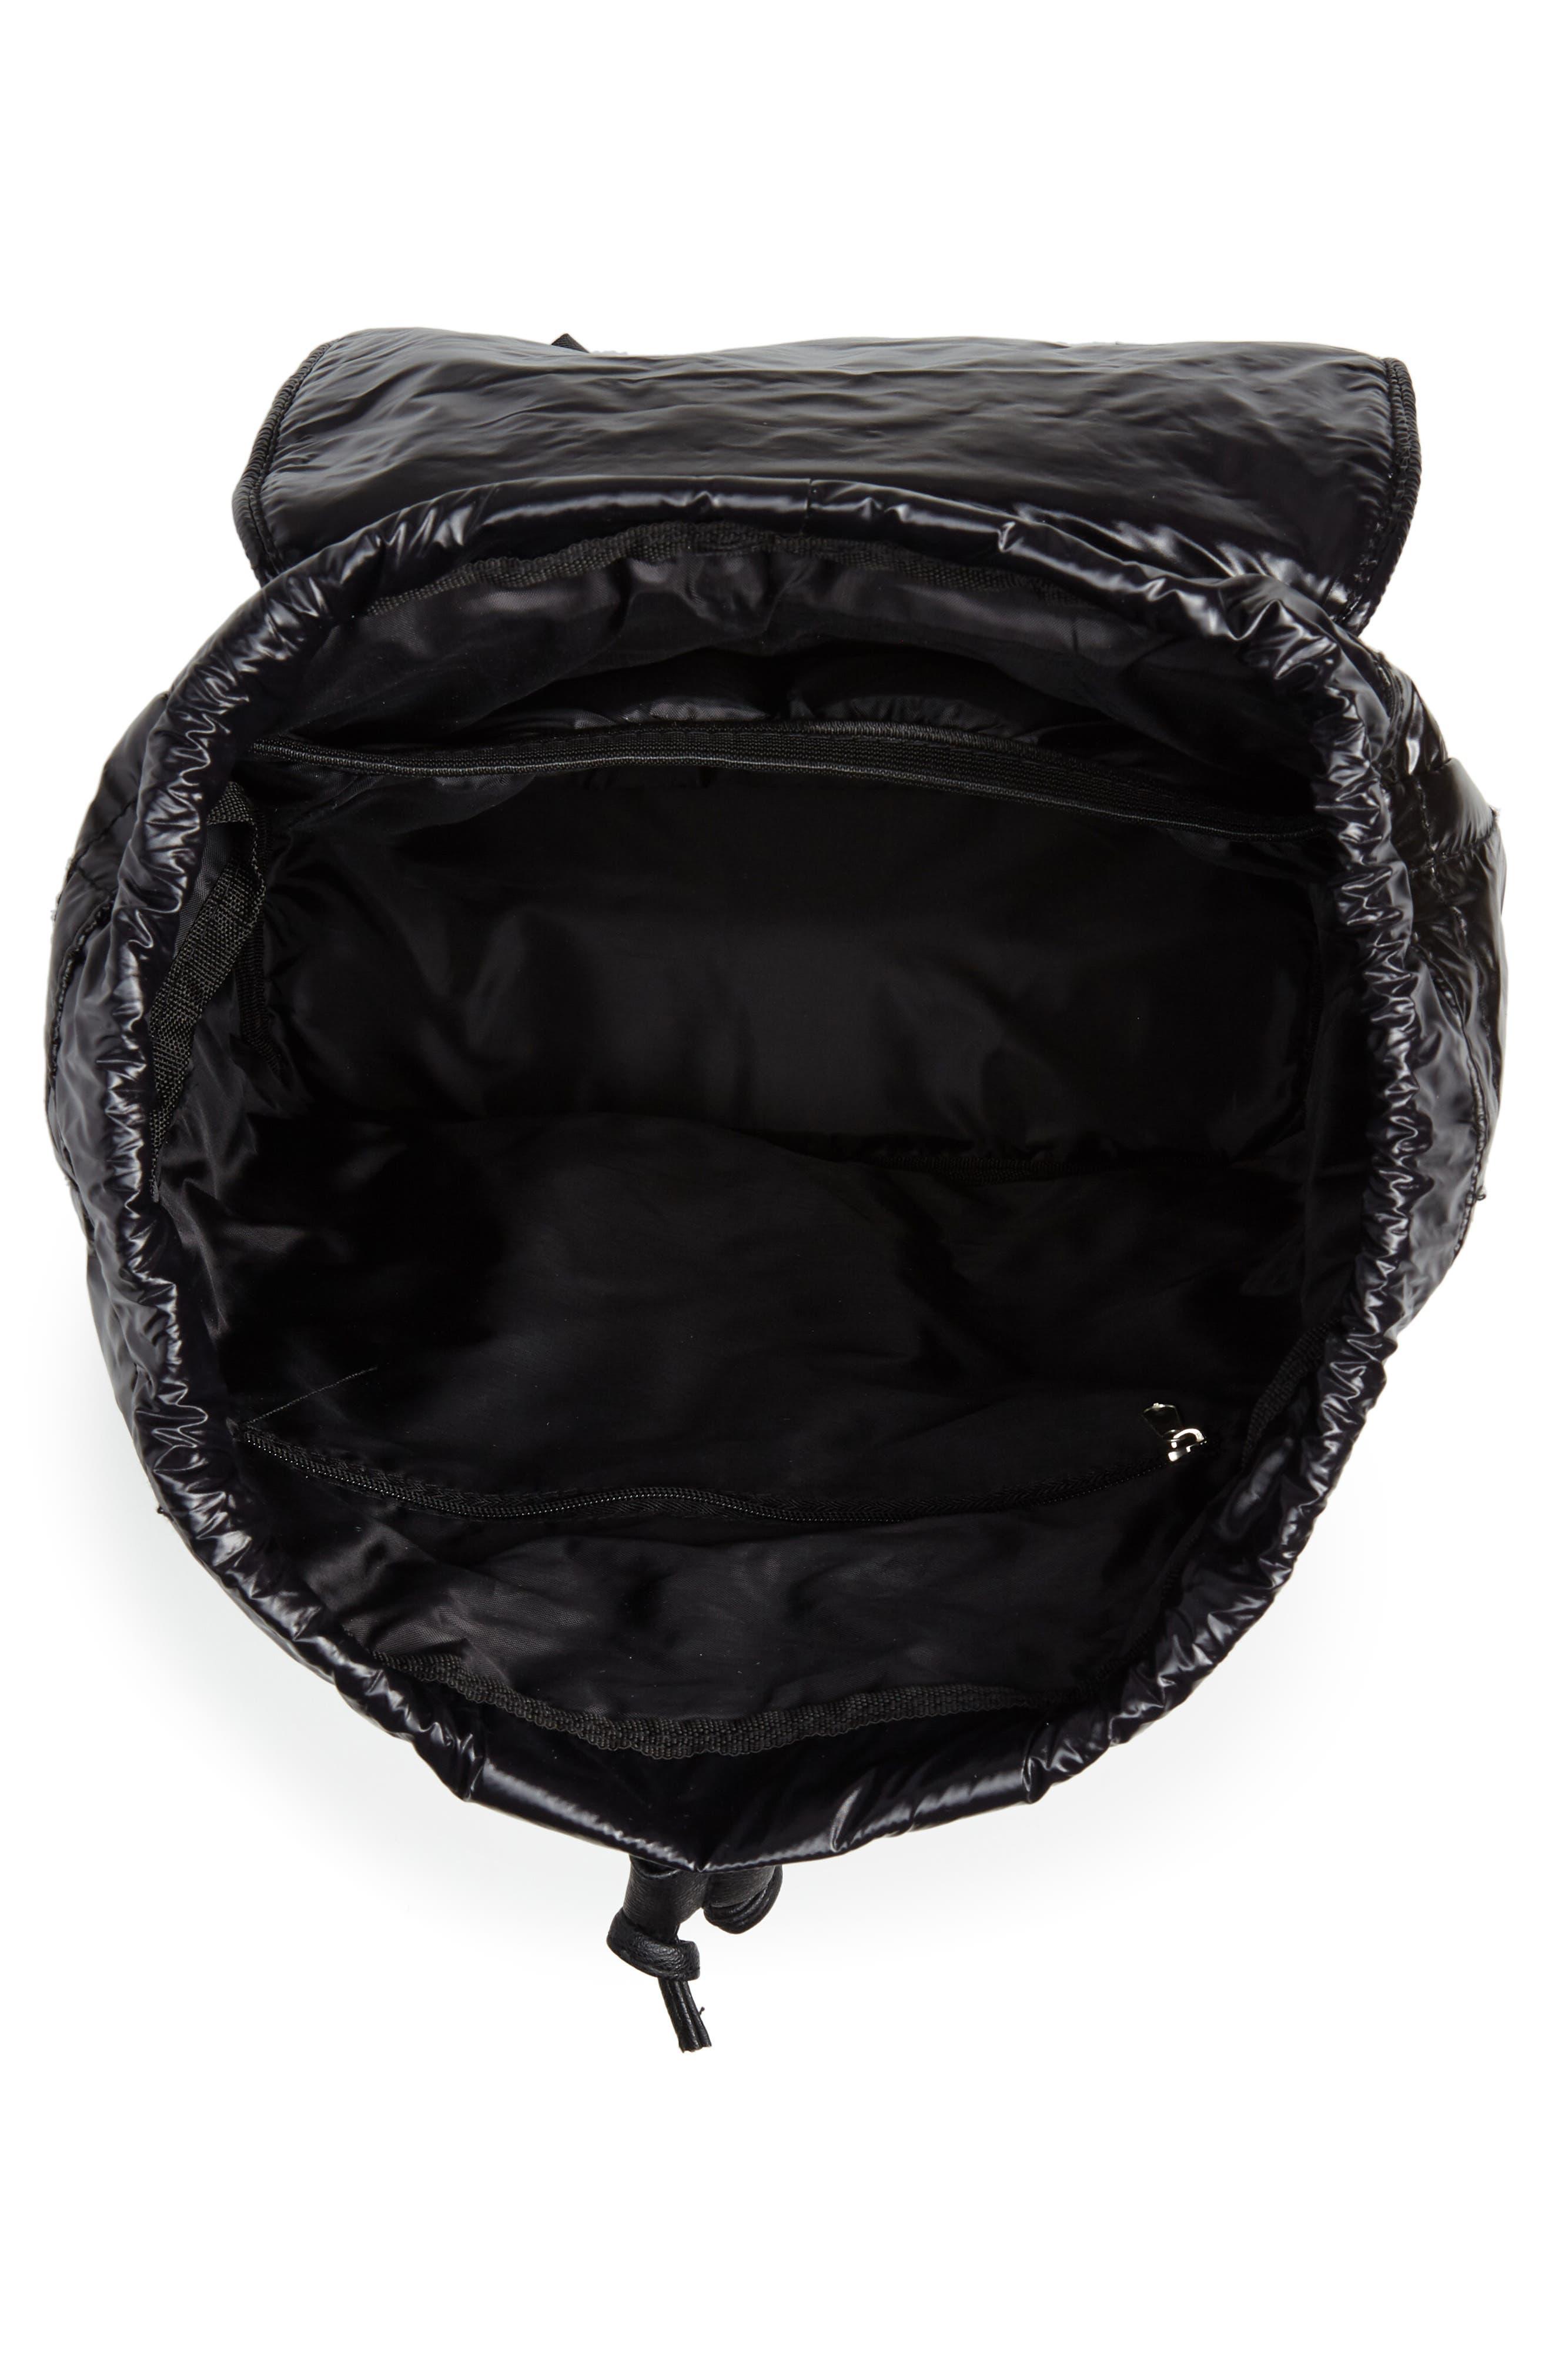 Puffer Backpack,                             Alternate thumbnail 6, color,                             Black